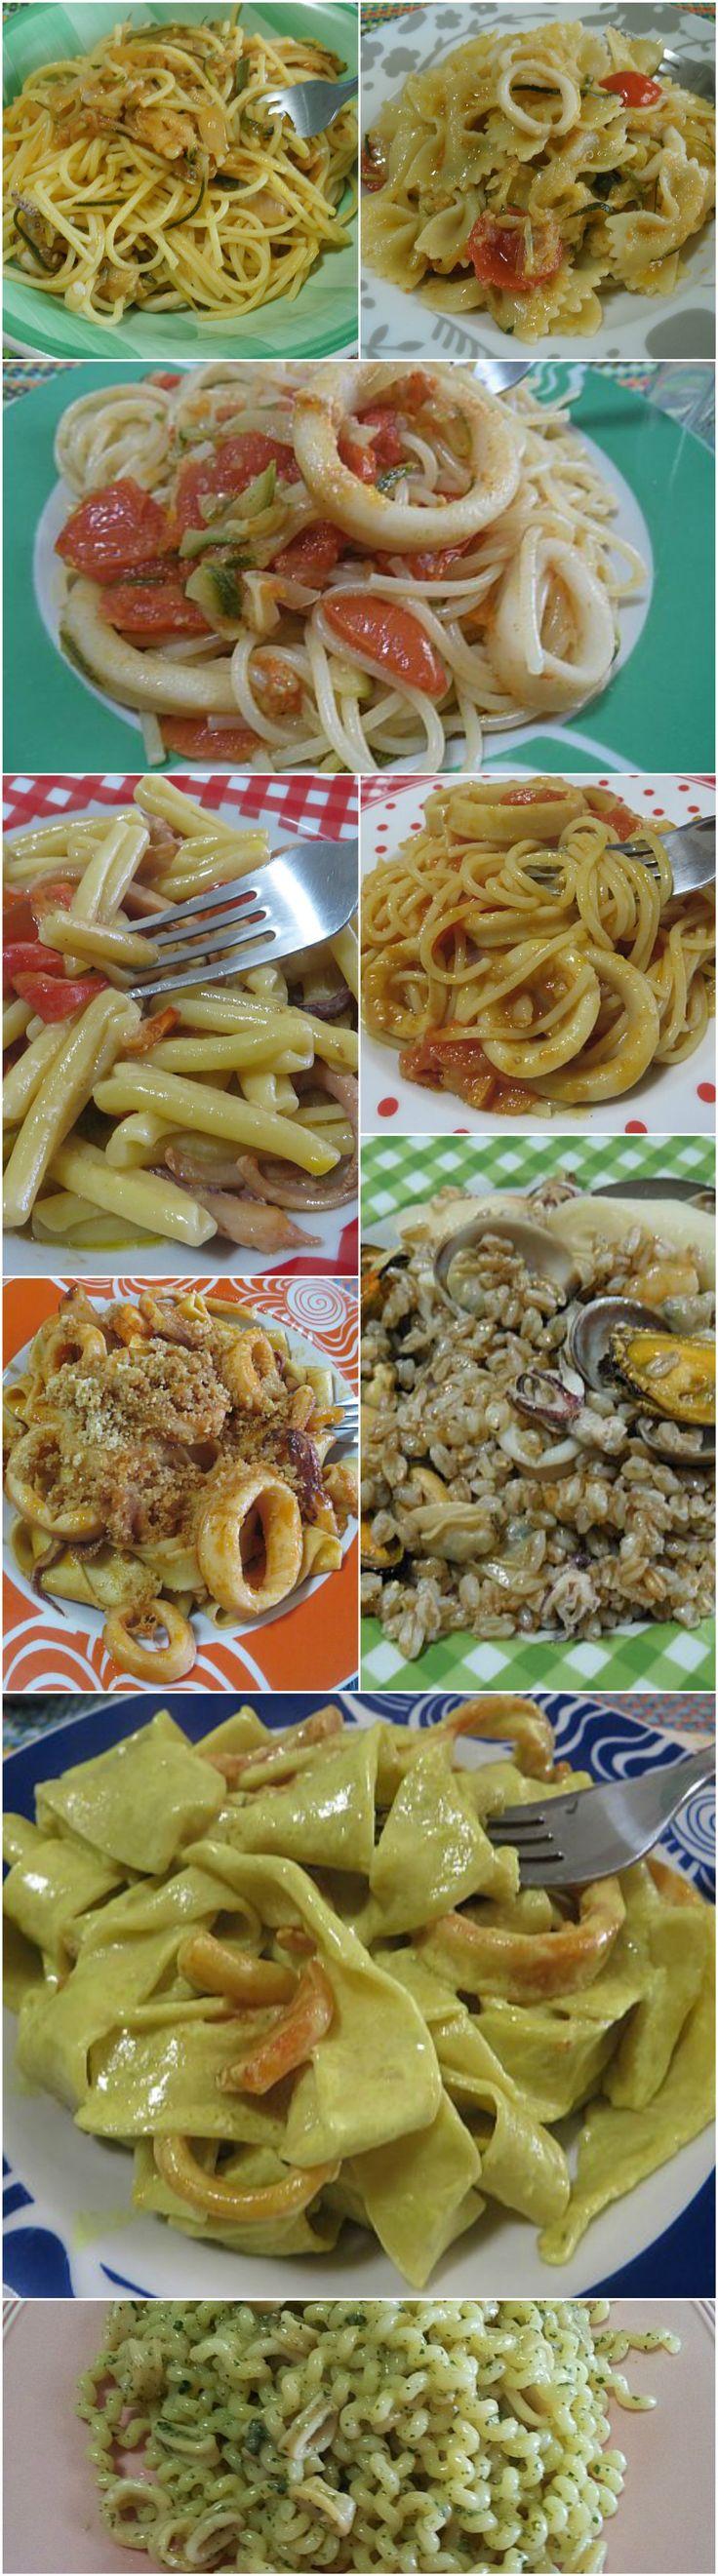 Raccolta di primi piatti con calamari !  #primipiatti #primidipesce  #ricettegustose #calamari